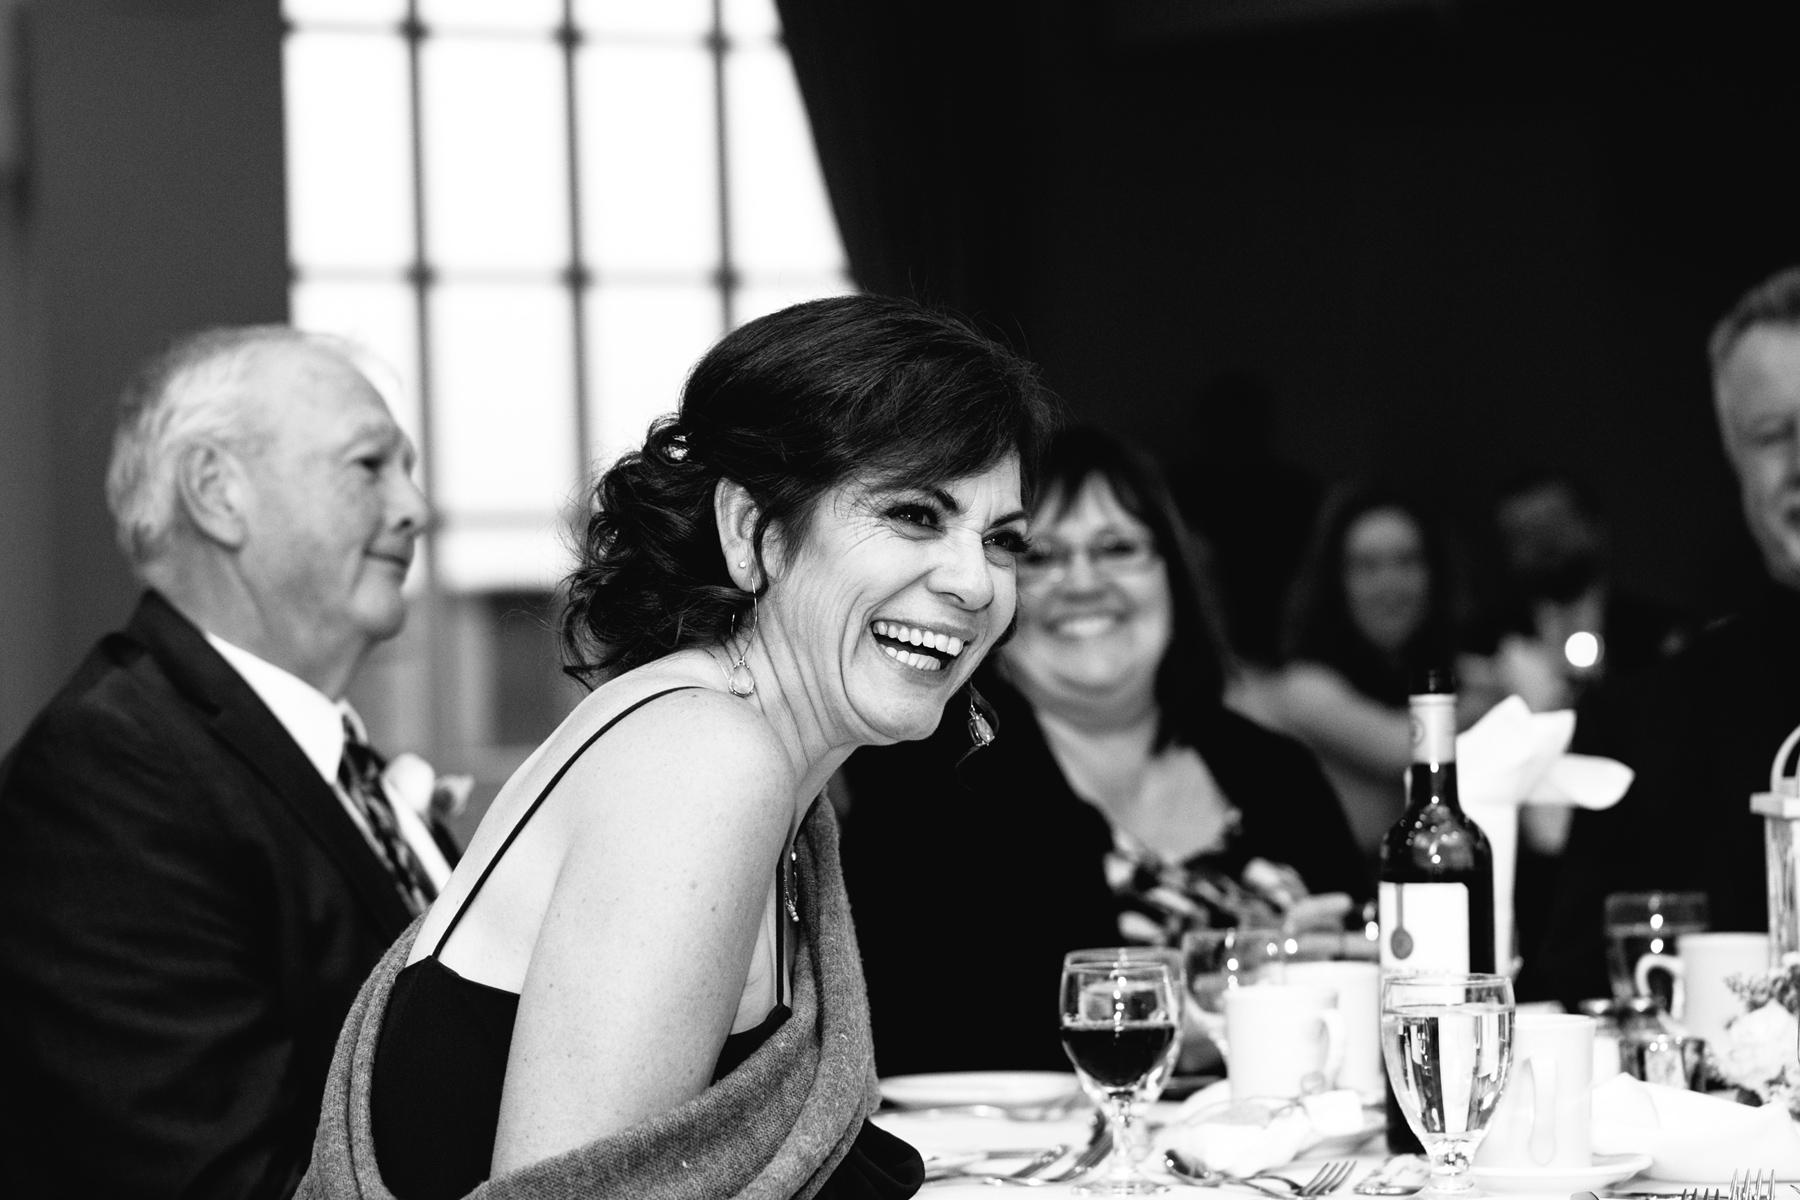 059-fredericton-wedding-photographer-kandisebrown-em2017